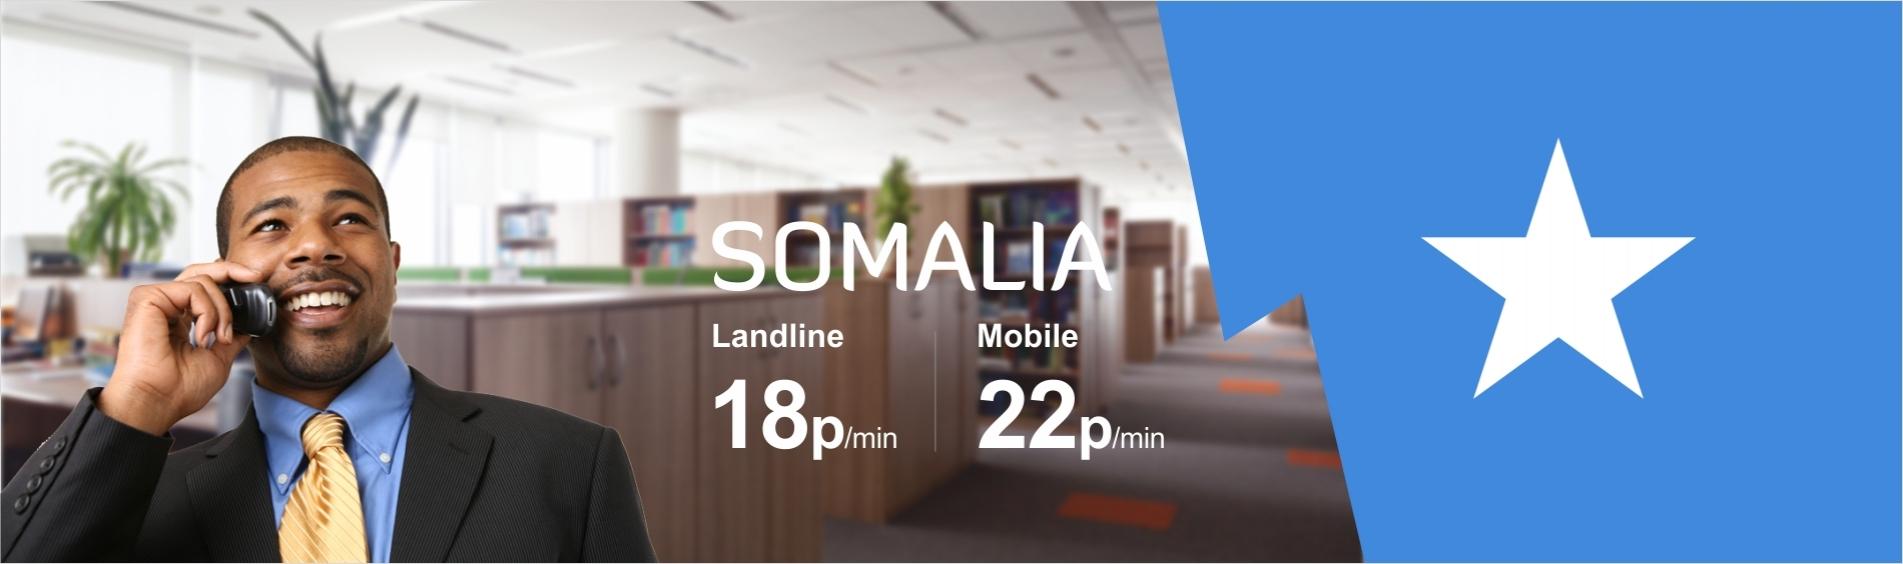 Somalia Best Rates